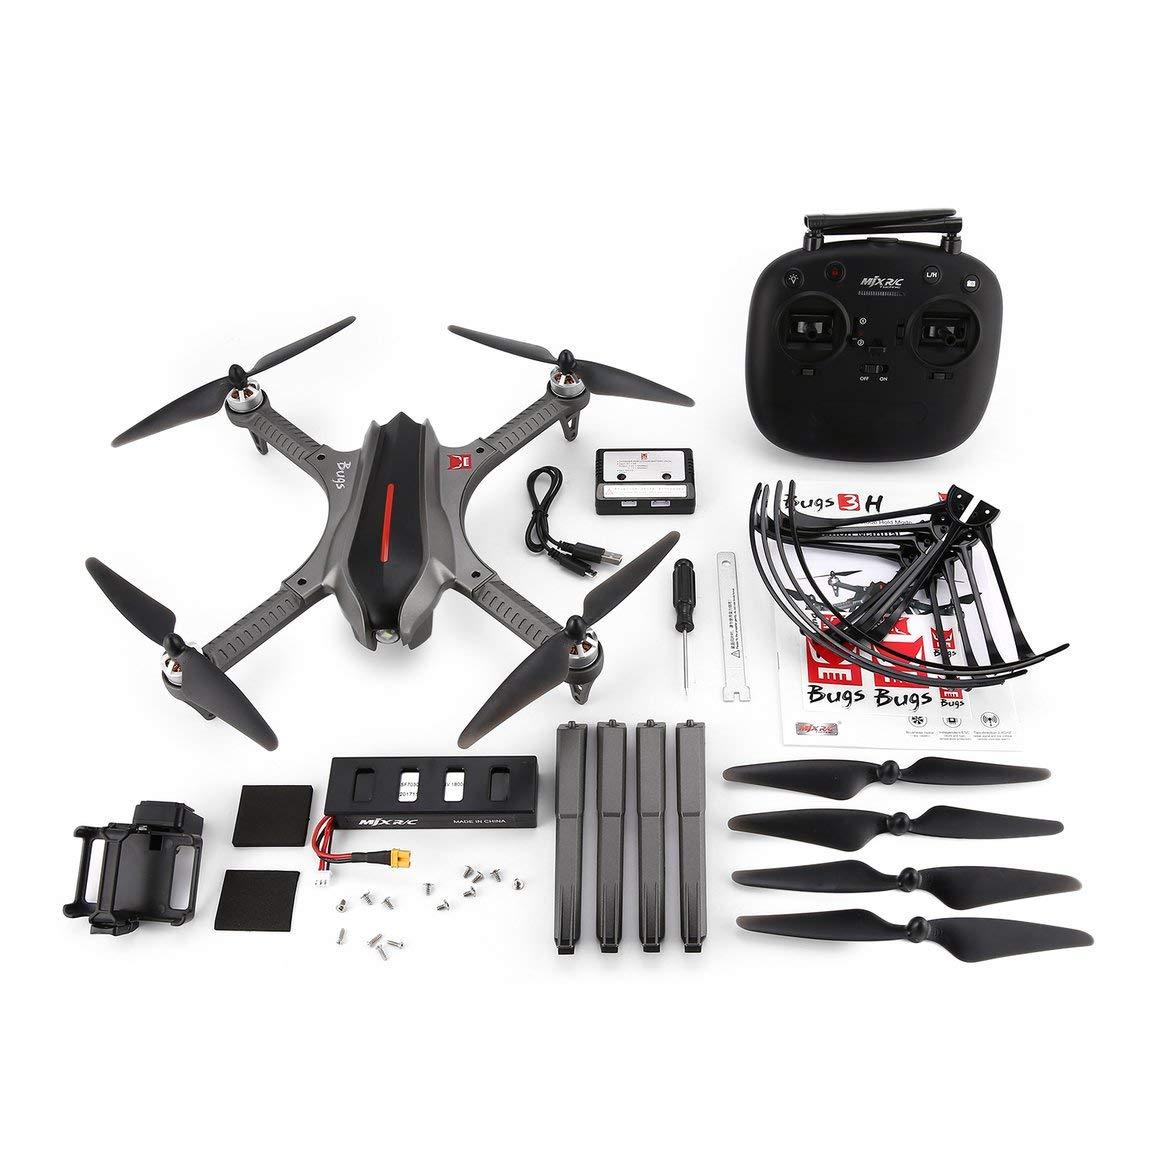 Delicacydex MJX Bugs B3H RC Drone Quadcopter Libre para Cambiar Altitude Hold RC Quadcopter Drone Motor sin escobillas 1806 1800KV Sin cámara